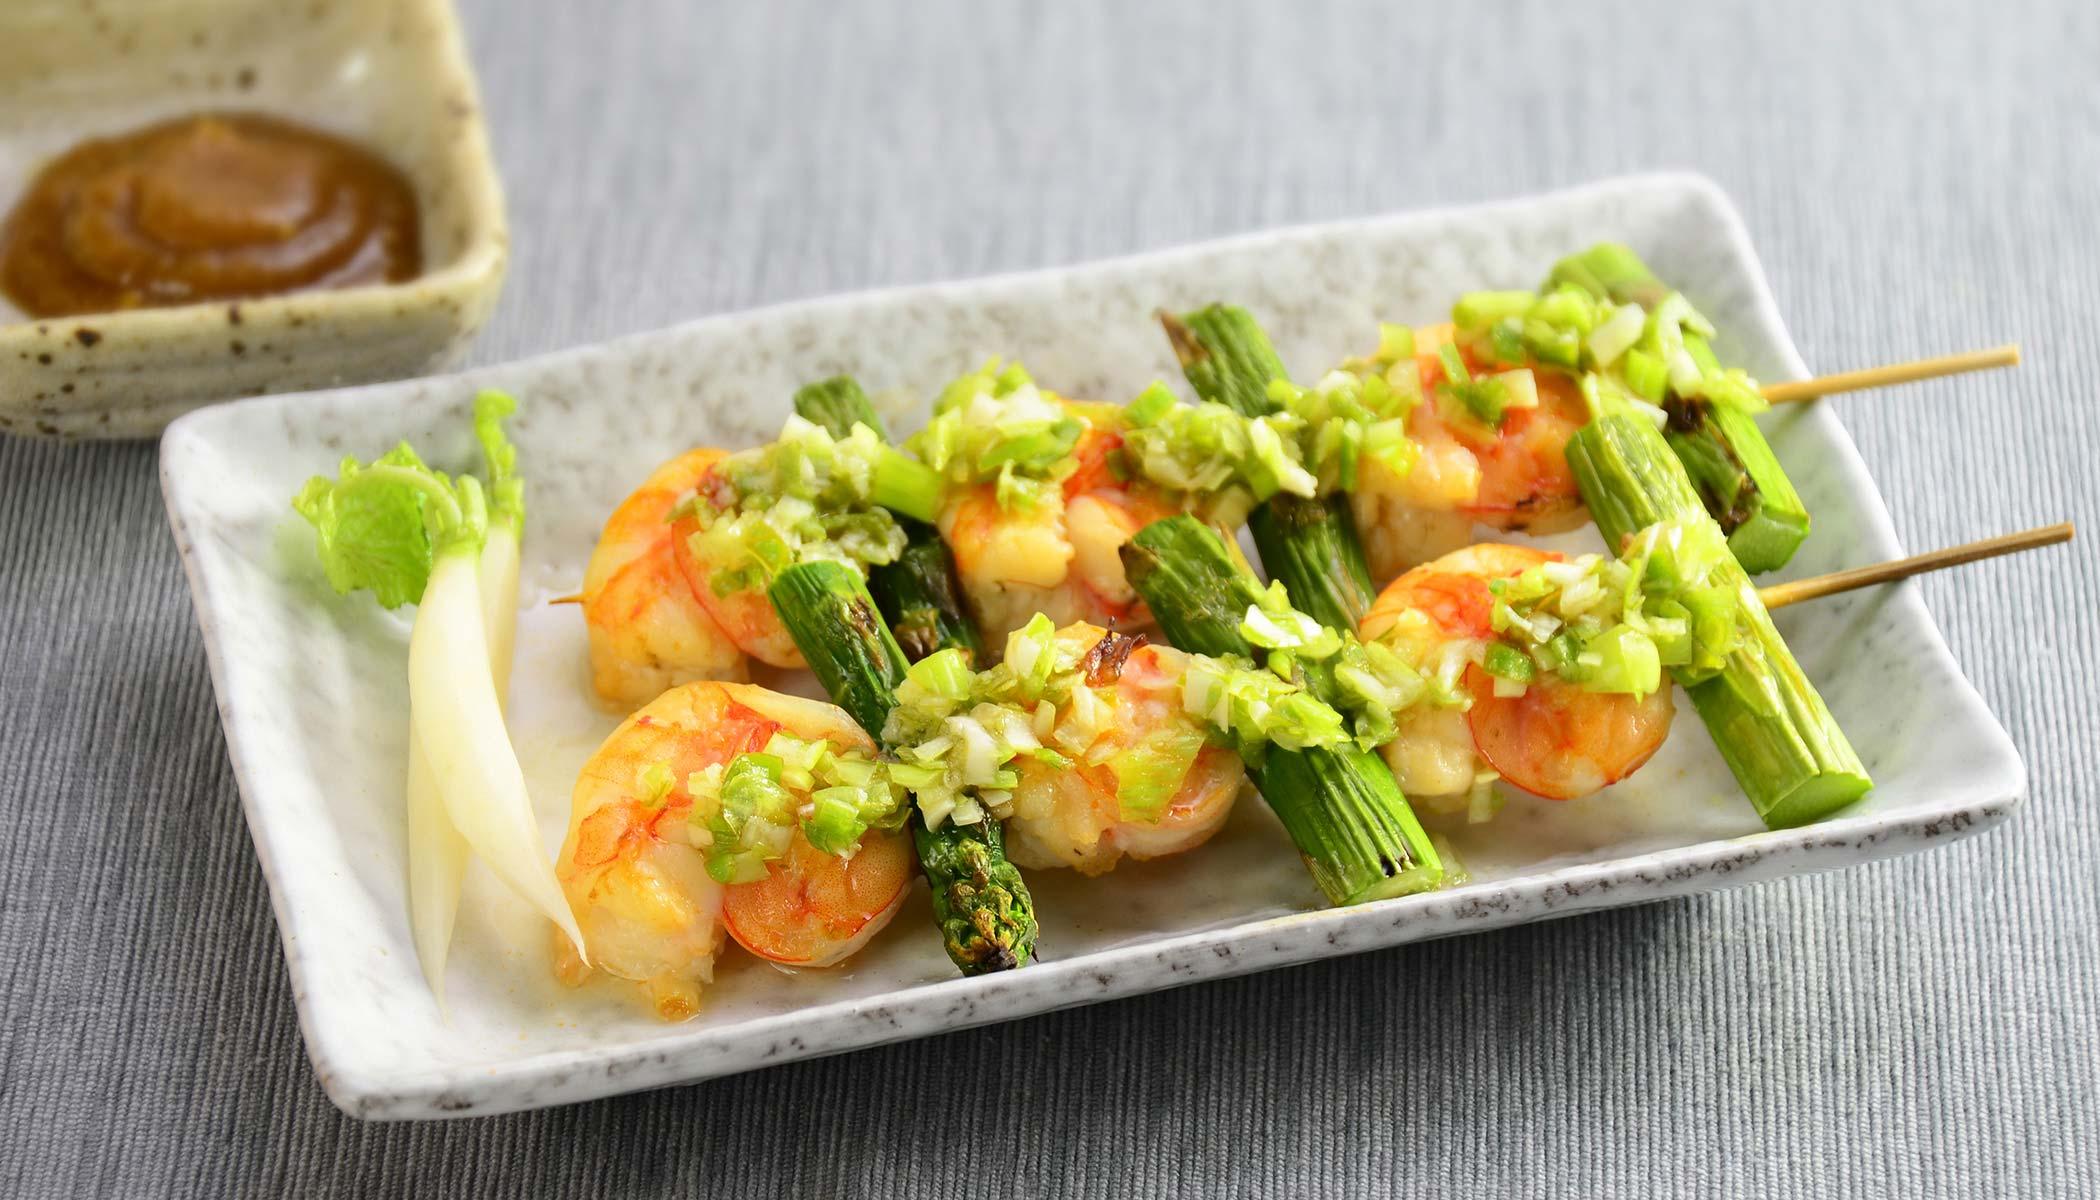 Crunchy Asparagus and Shrimp Skewers